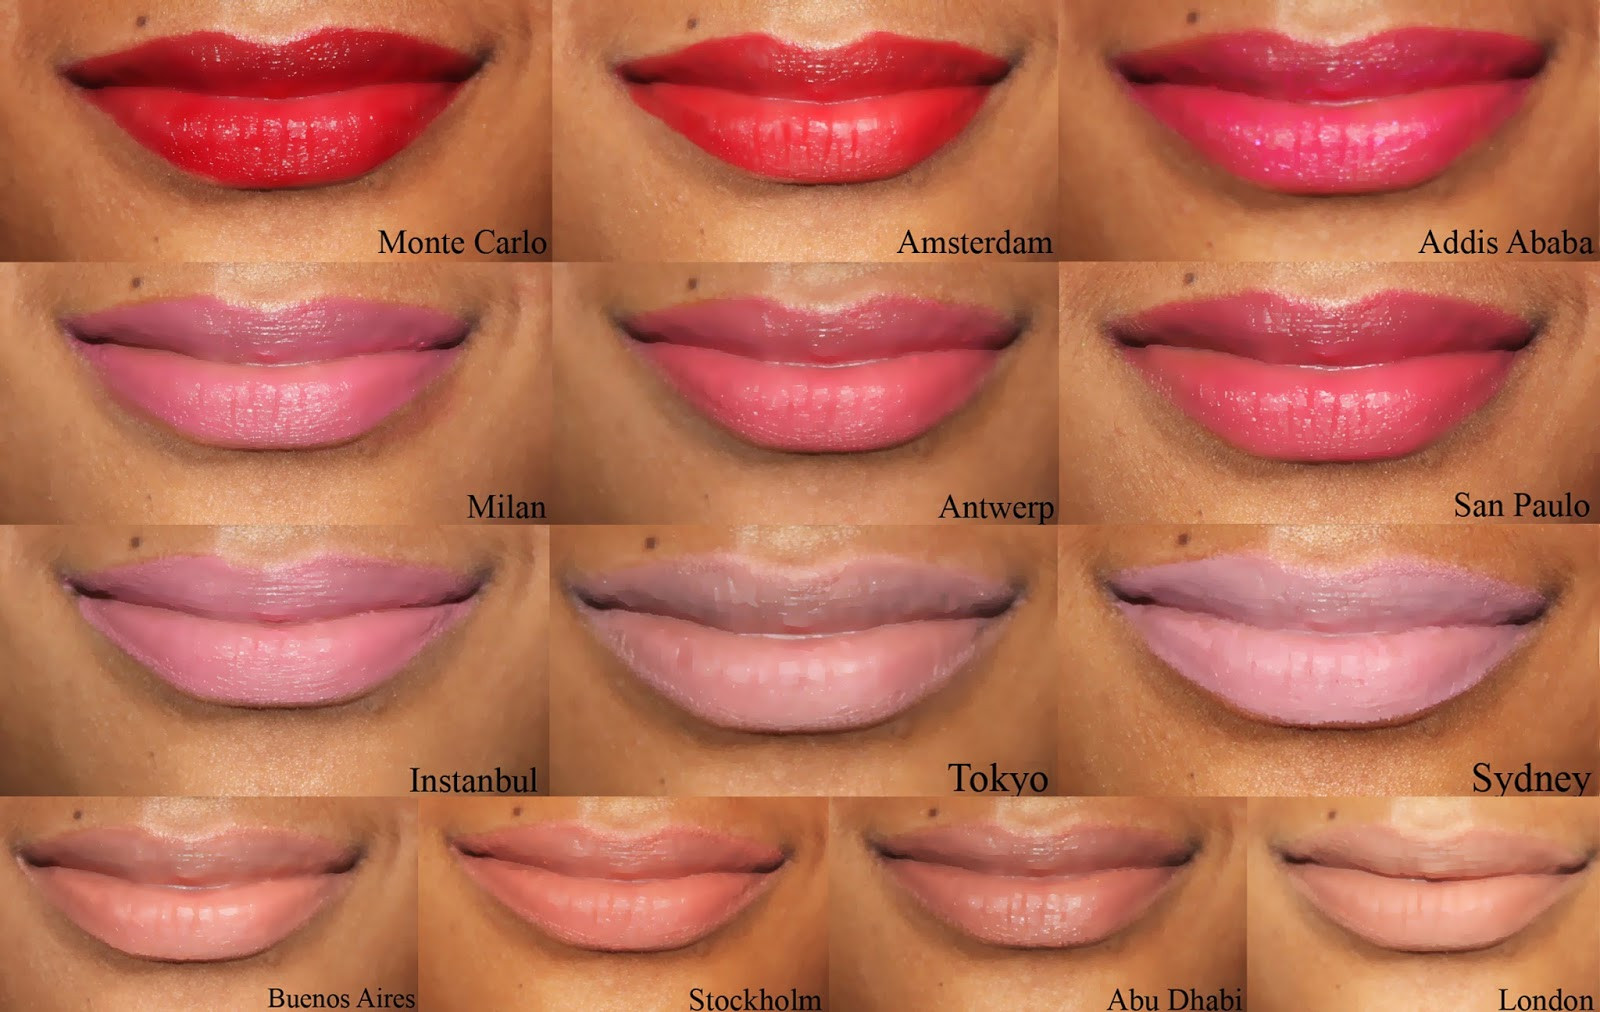 Nyx Soft Matte Lip Cream Swatches  Love Naheeda NYX SOFT MATTE LIP CREAM SWATCHES